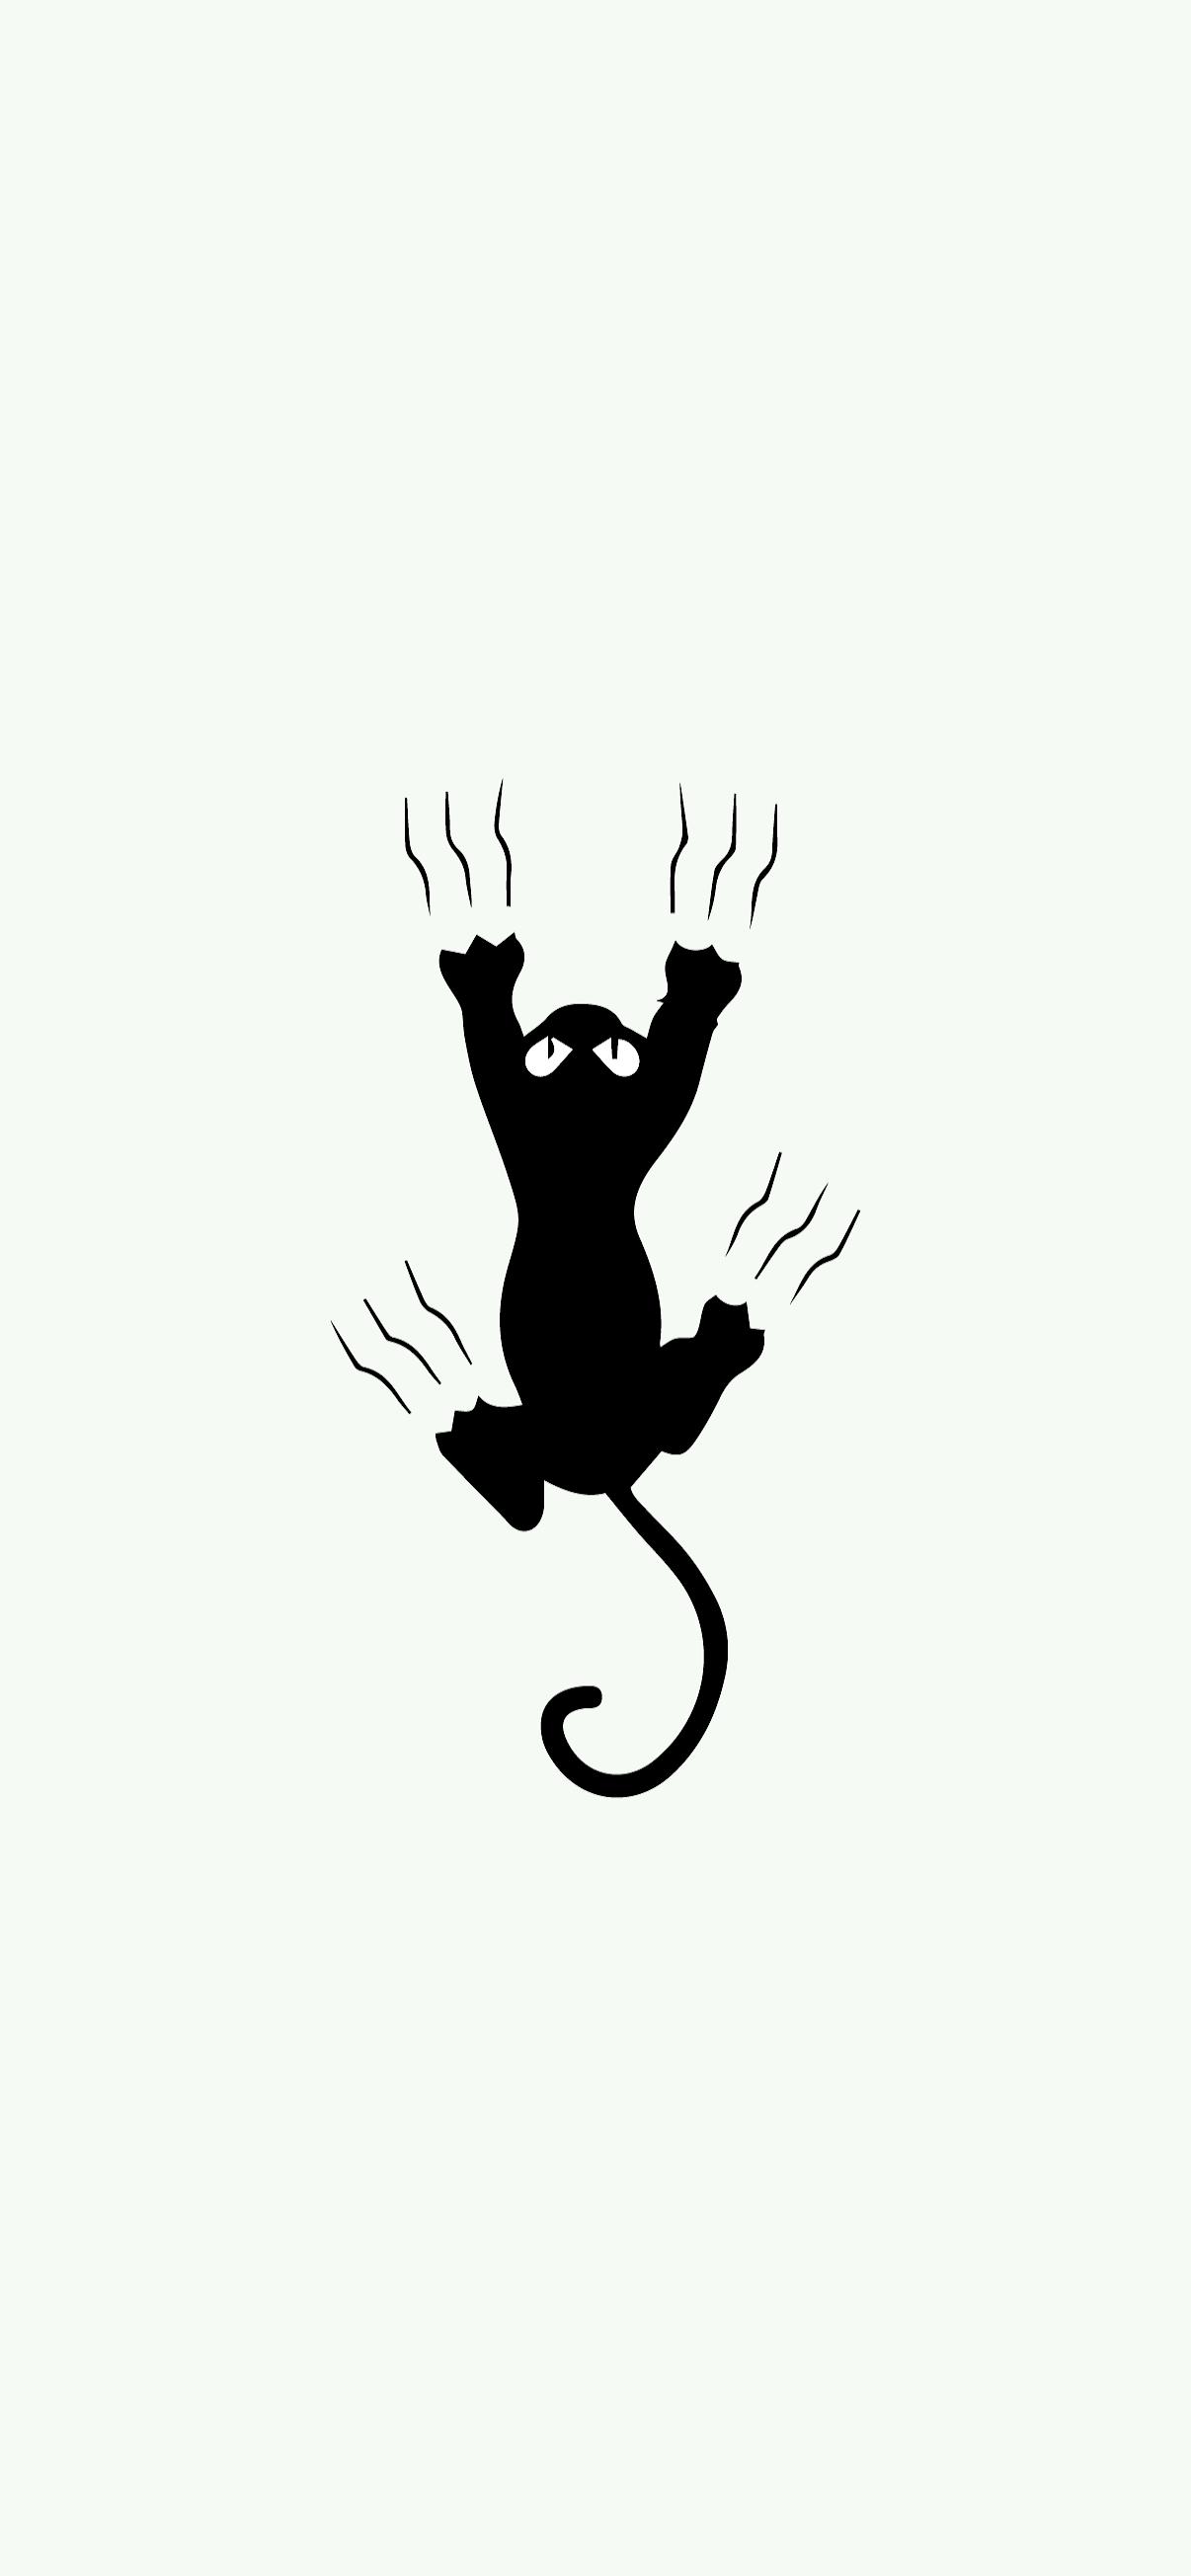 cat scratching minimalist wallpaper hd for phone